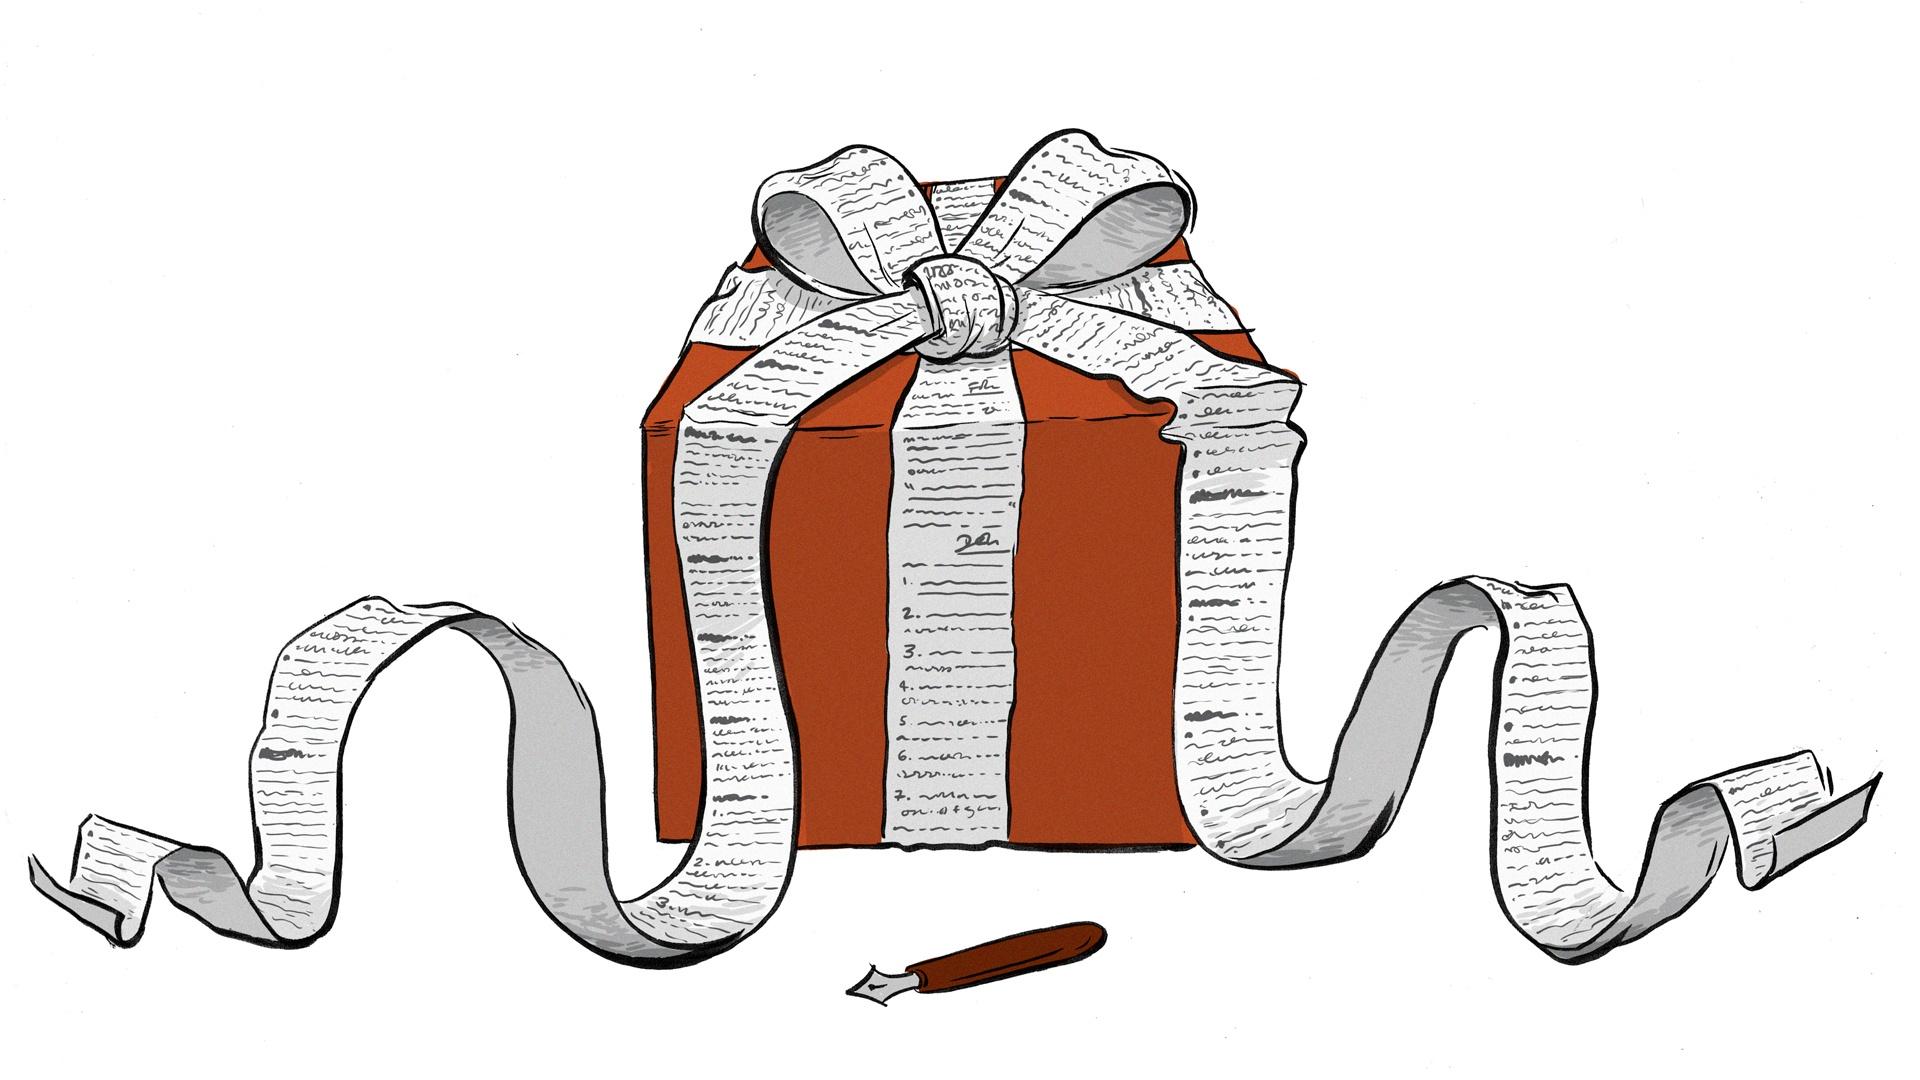 cash give family Deed of gift Headline Image - TD MoneyTalk Life